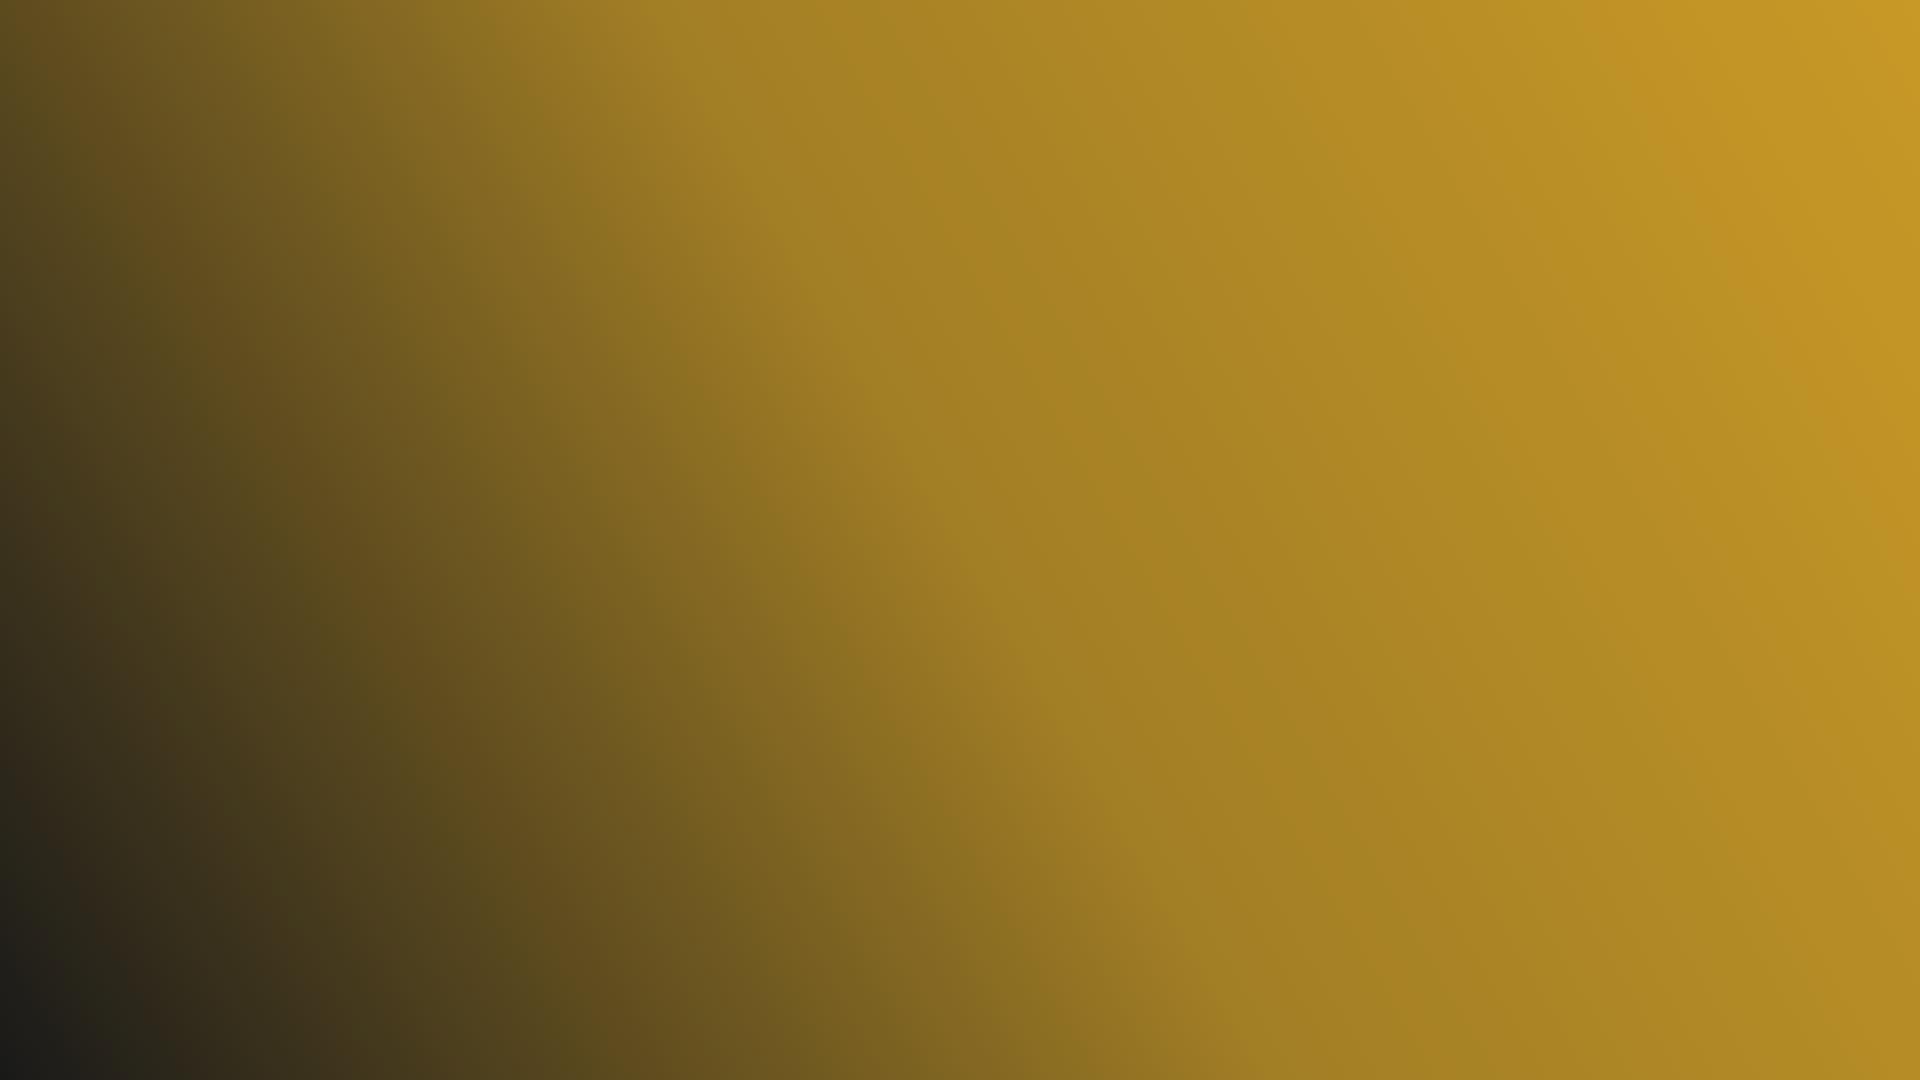 Purdue University Hex Colors CSS Gradient Brand Gradients 1920x1080